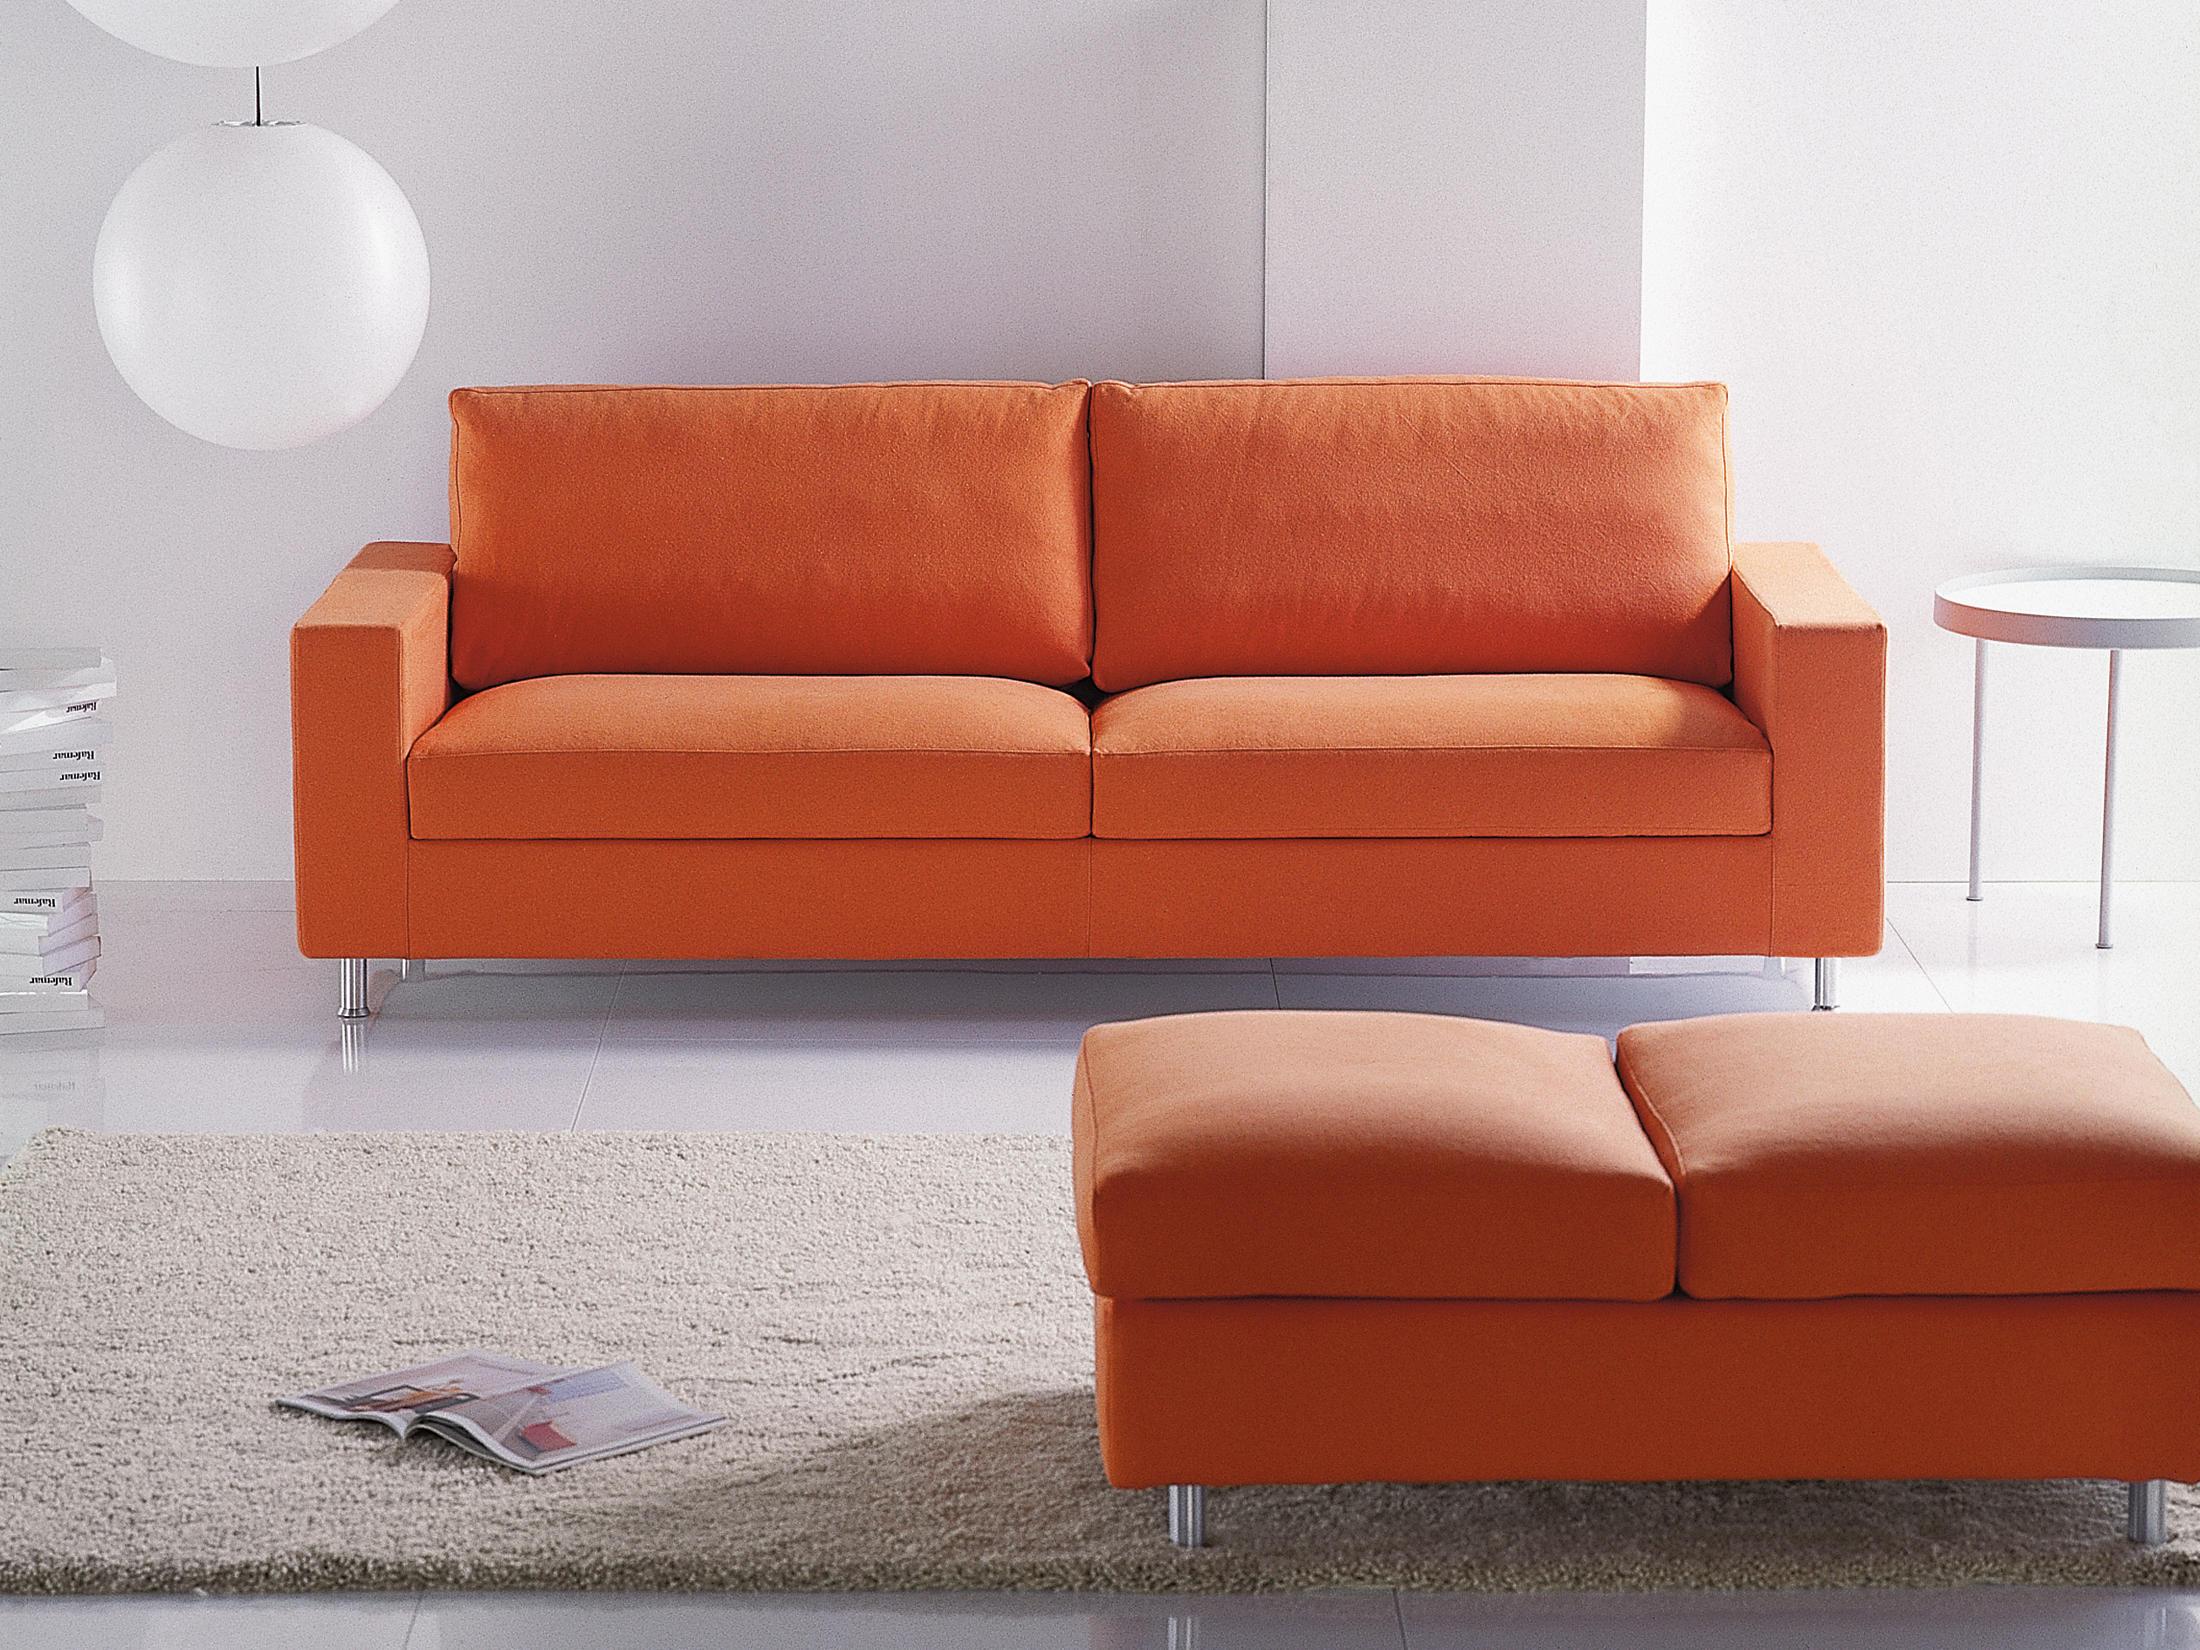 Terra divani lounge rafemar architonic - Rafemar sofas ...